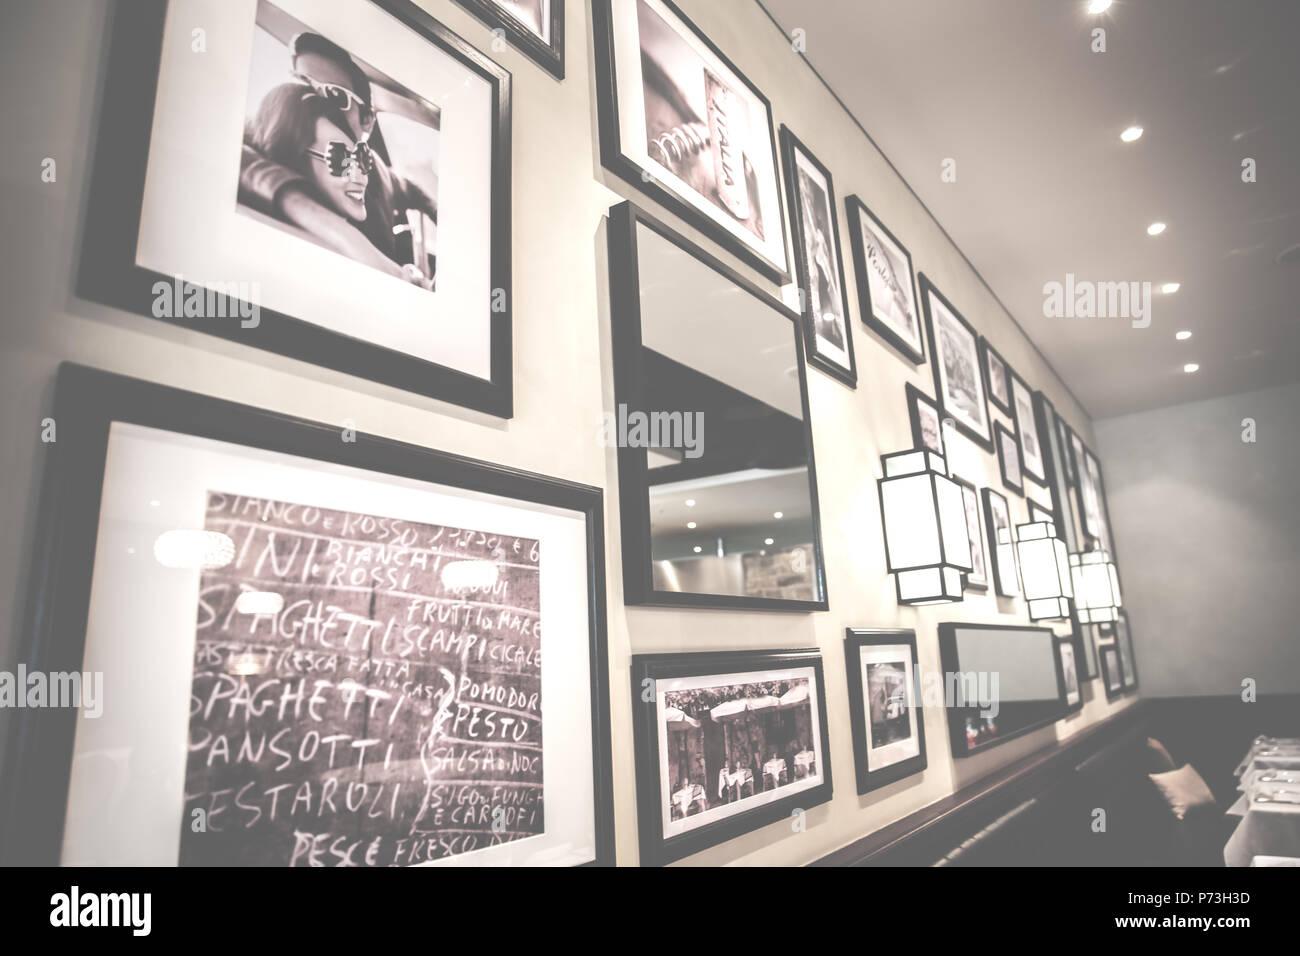 Cafe Restaurant Framed Photo Wall Decoration - Stock Image